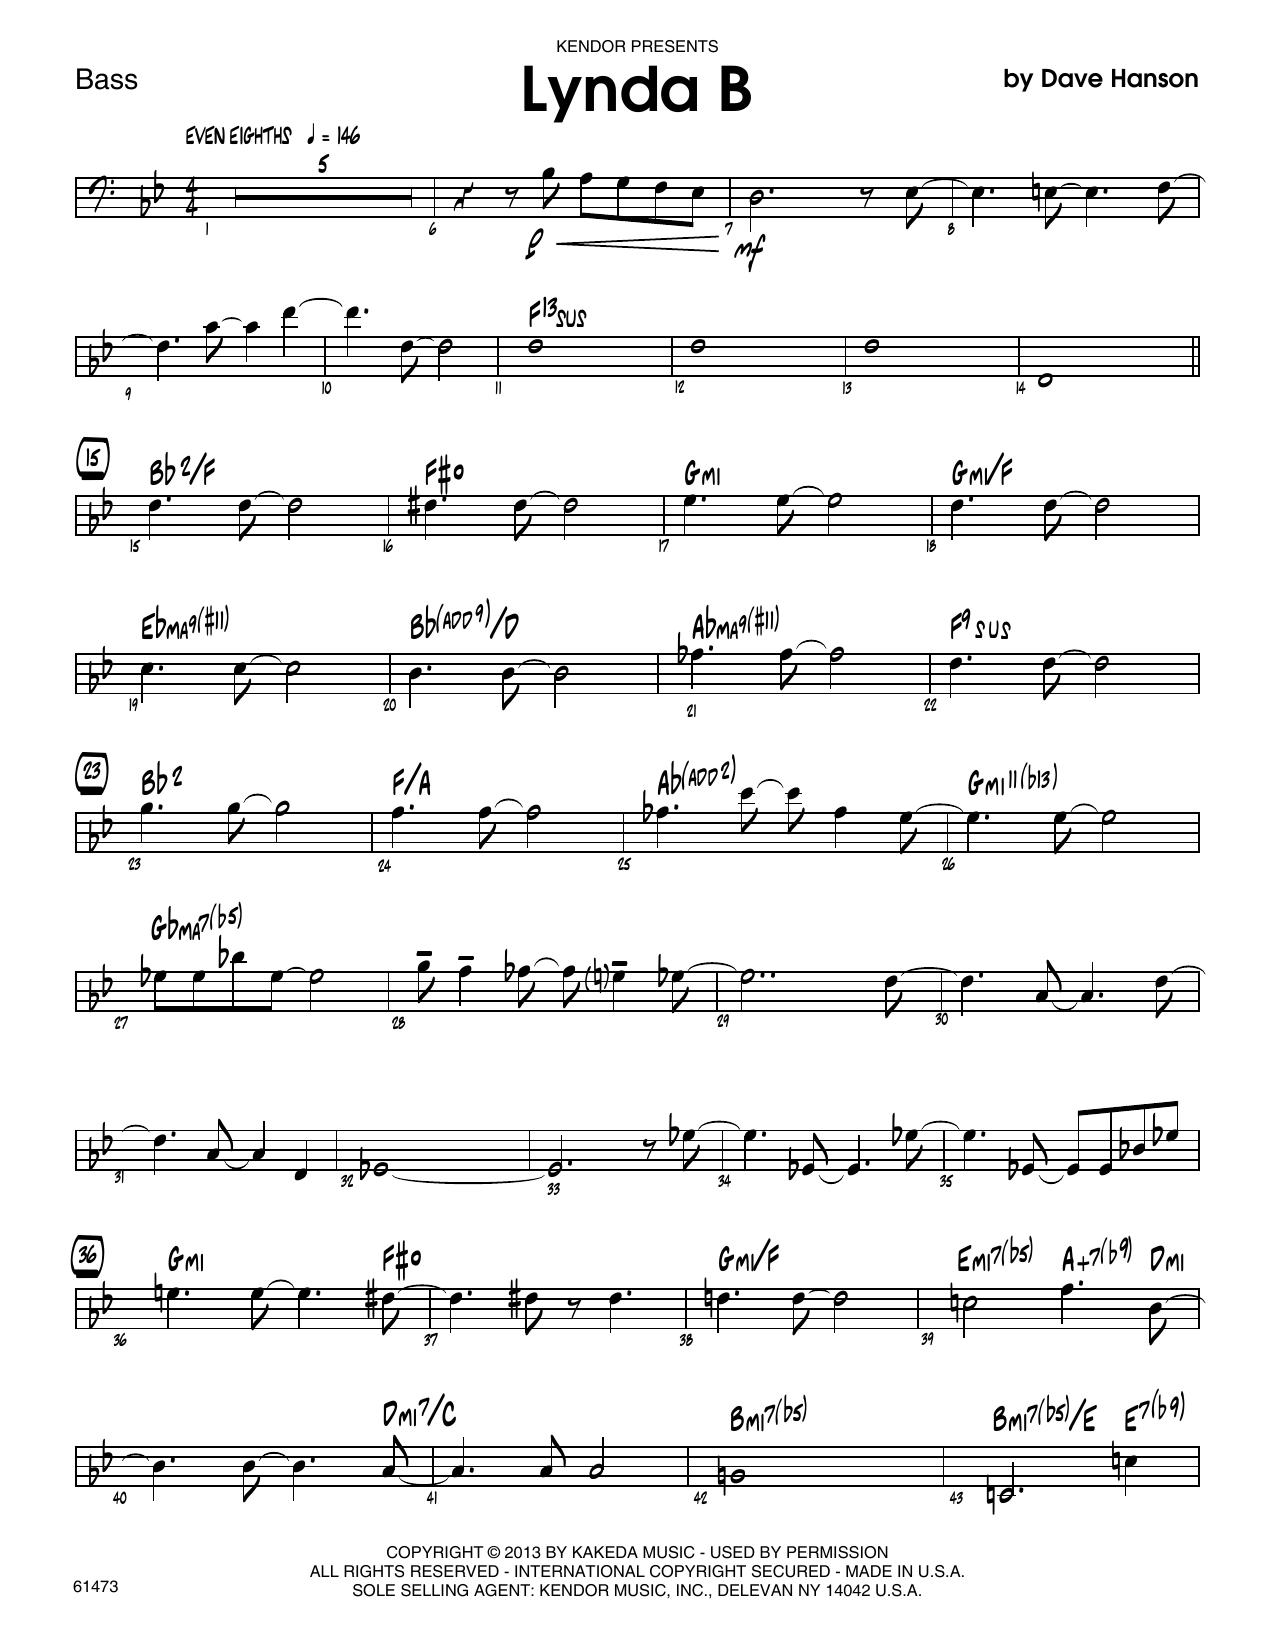 Lynda B - Bass Sheet Music